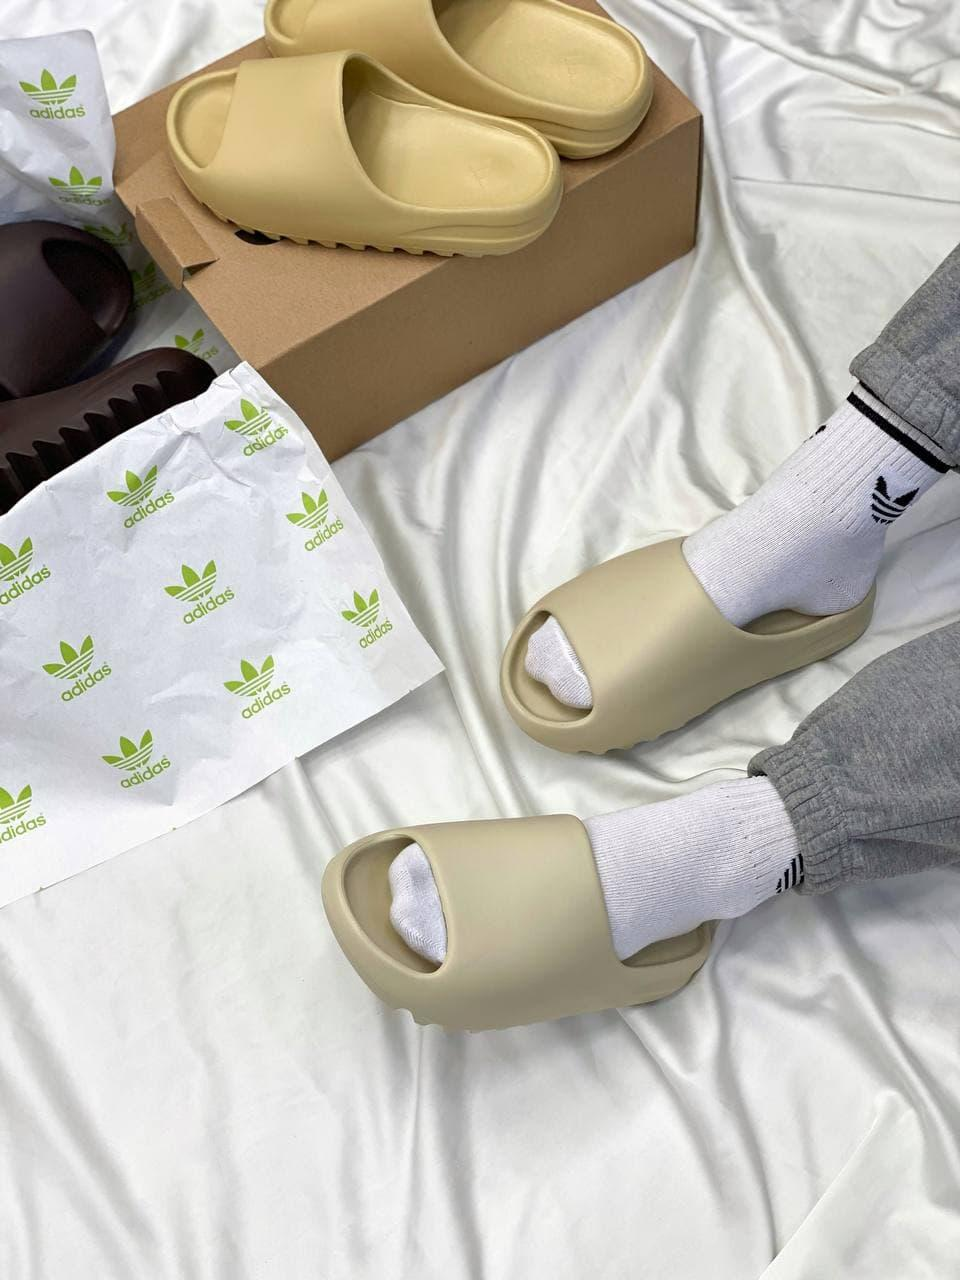 Женские шлепки Adidas Yeezy Slide Soot (бежевые) YE023 резиновые тапочки на лето